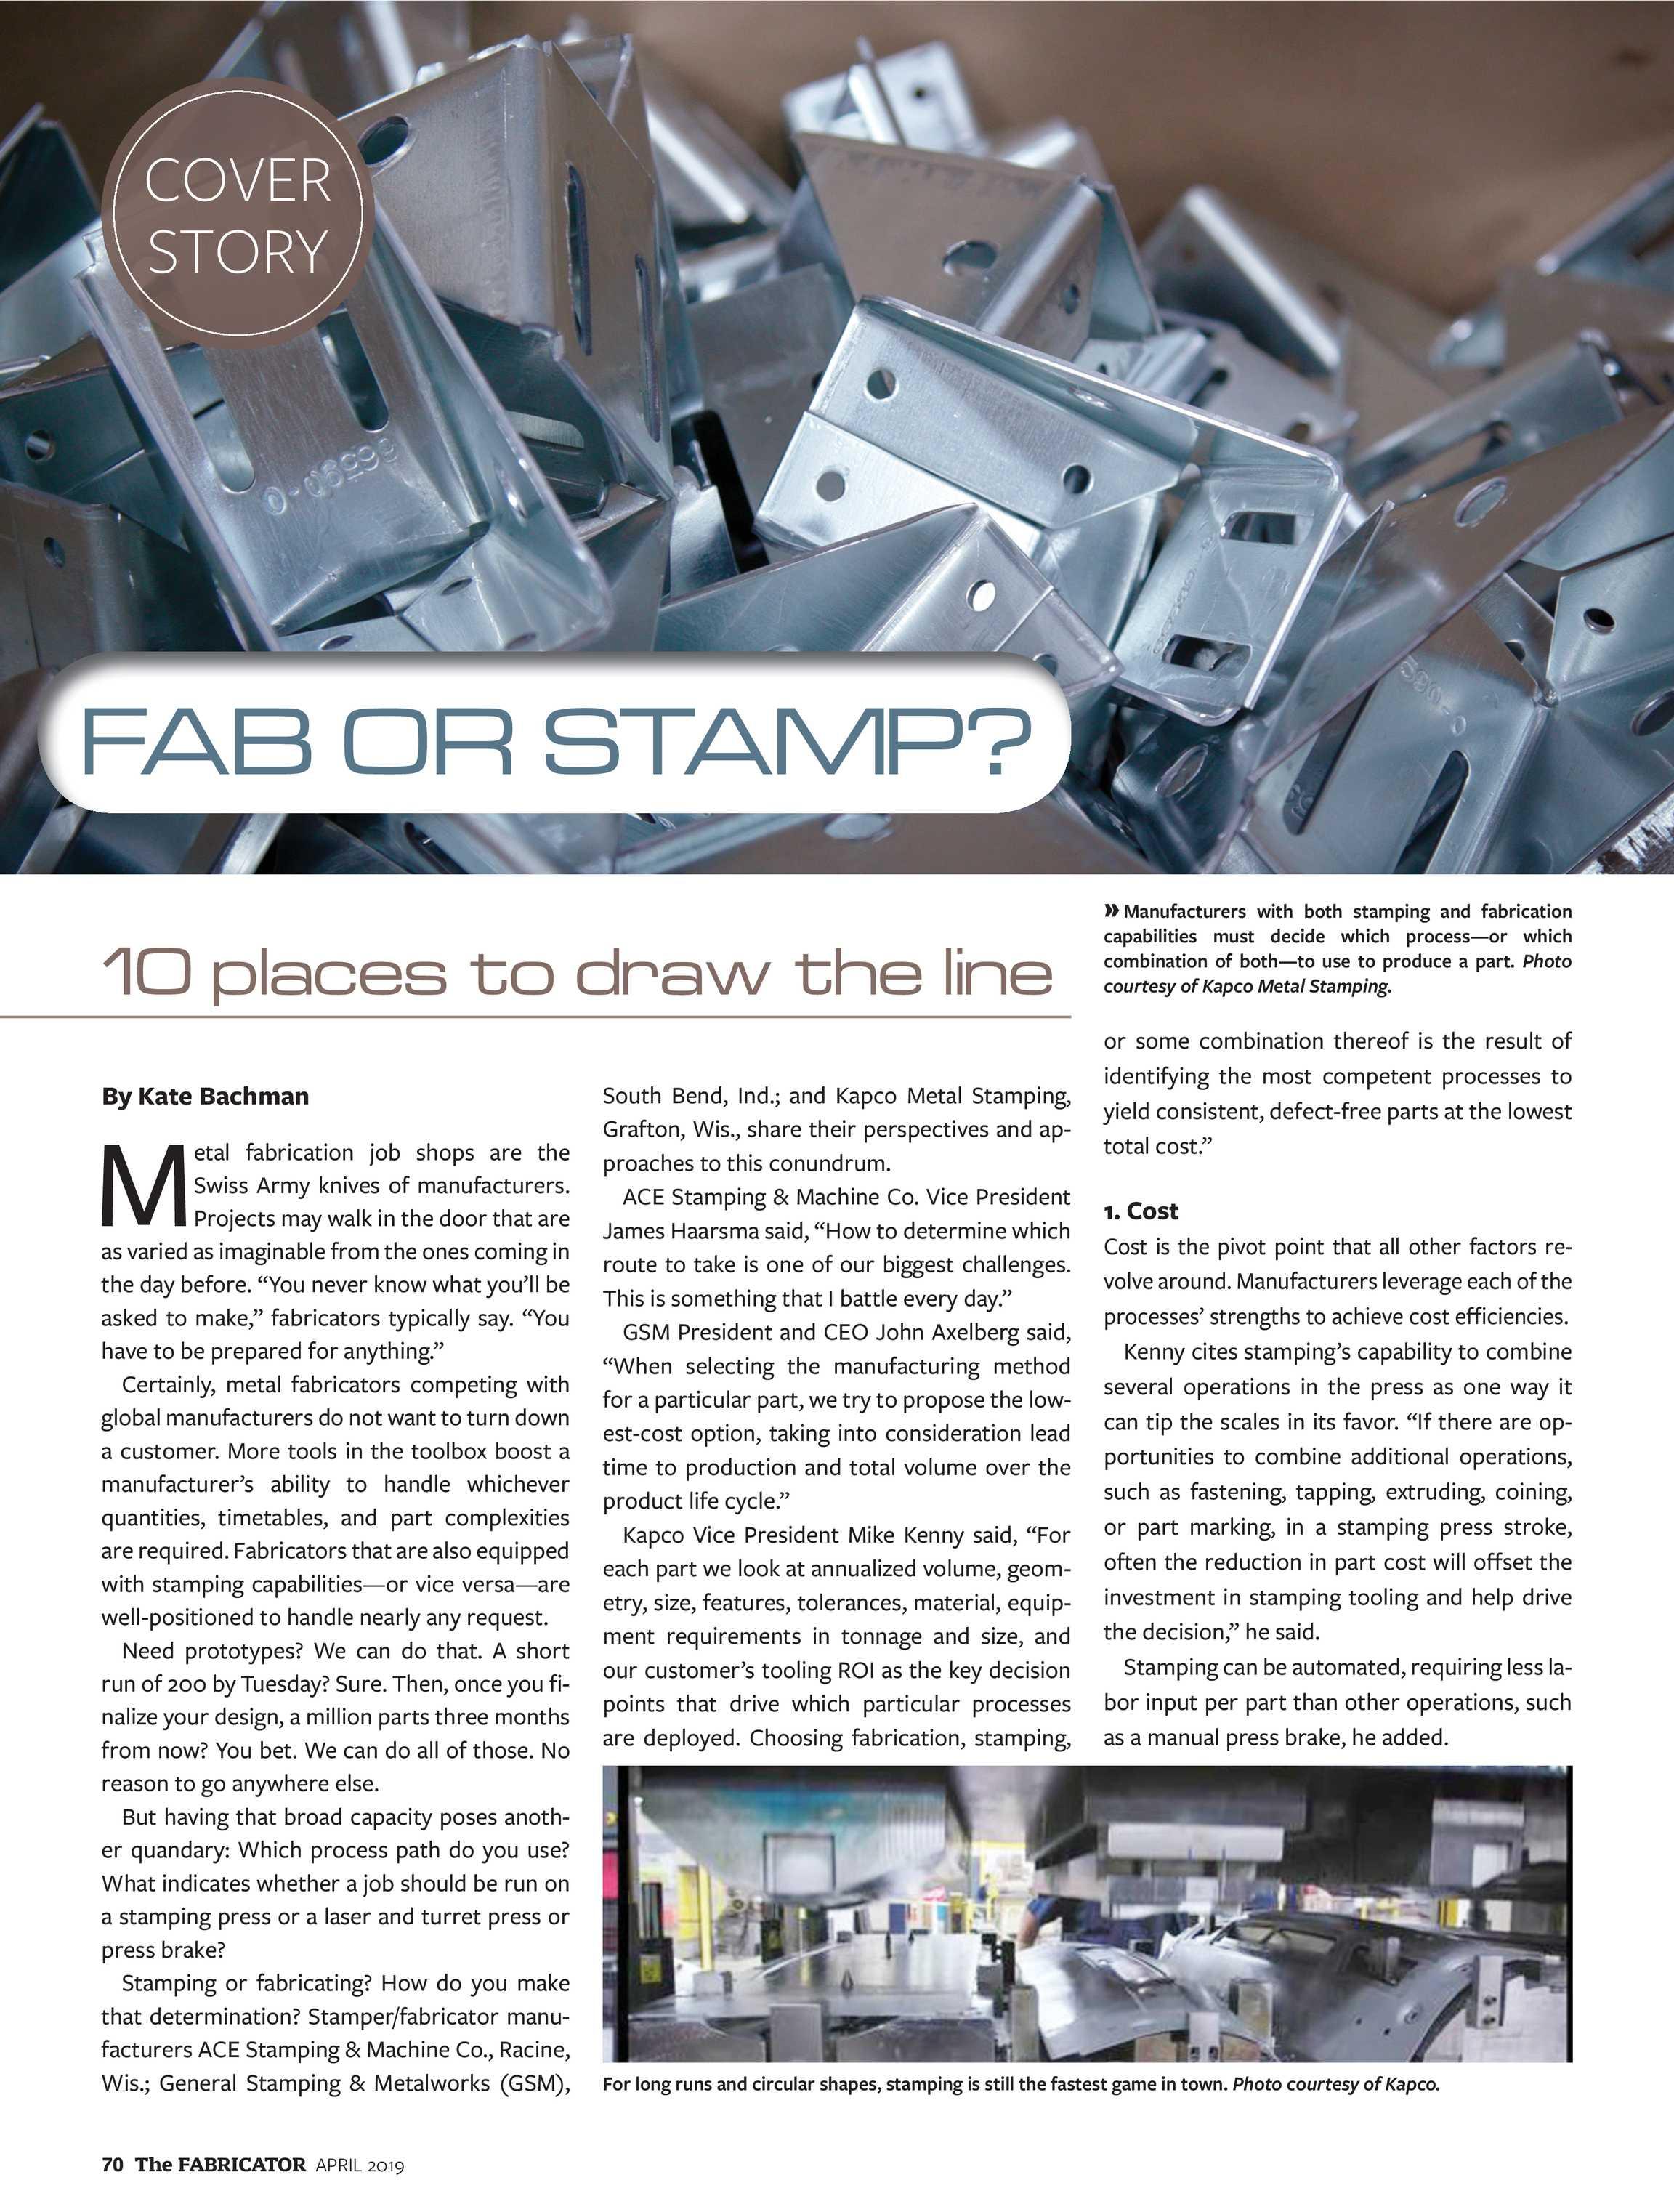 The Fabricator - April 2019 - page 69